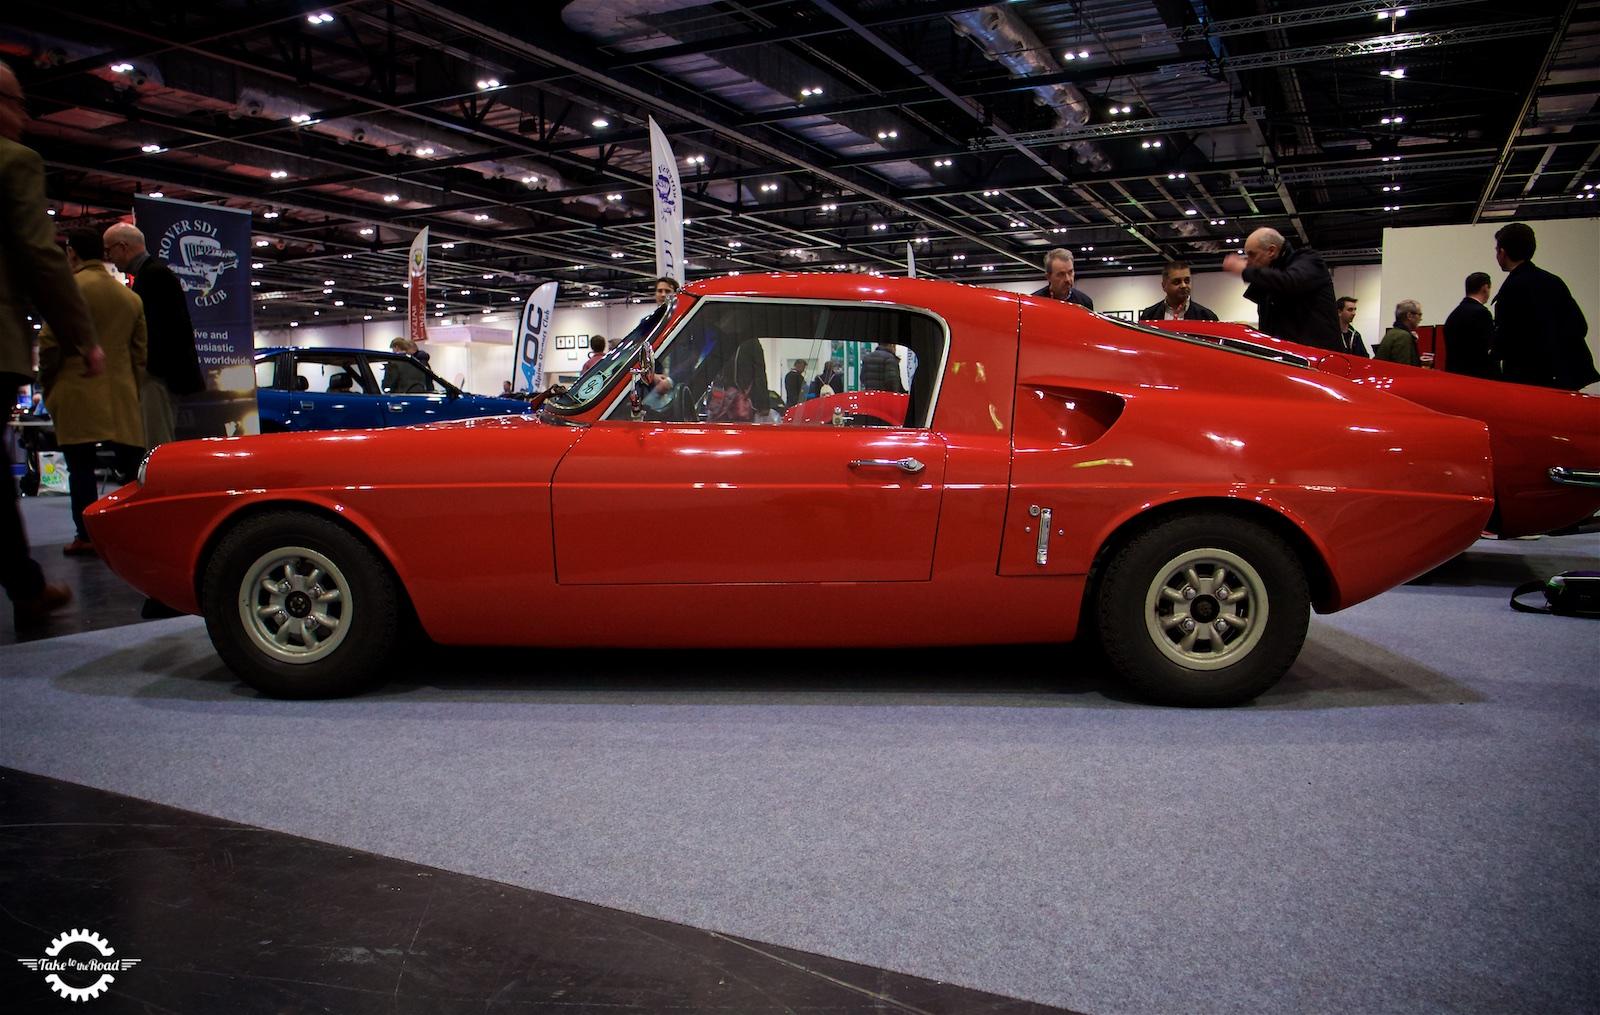 London Classic Car Show 2018 Highlights